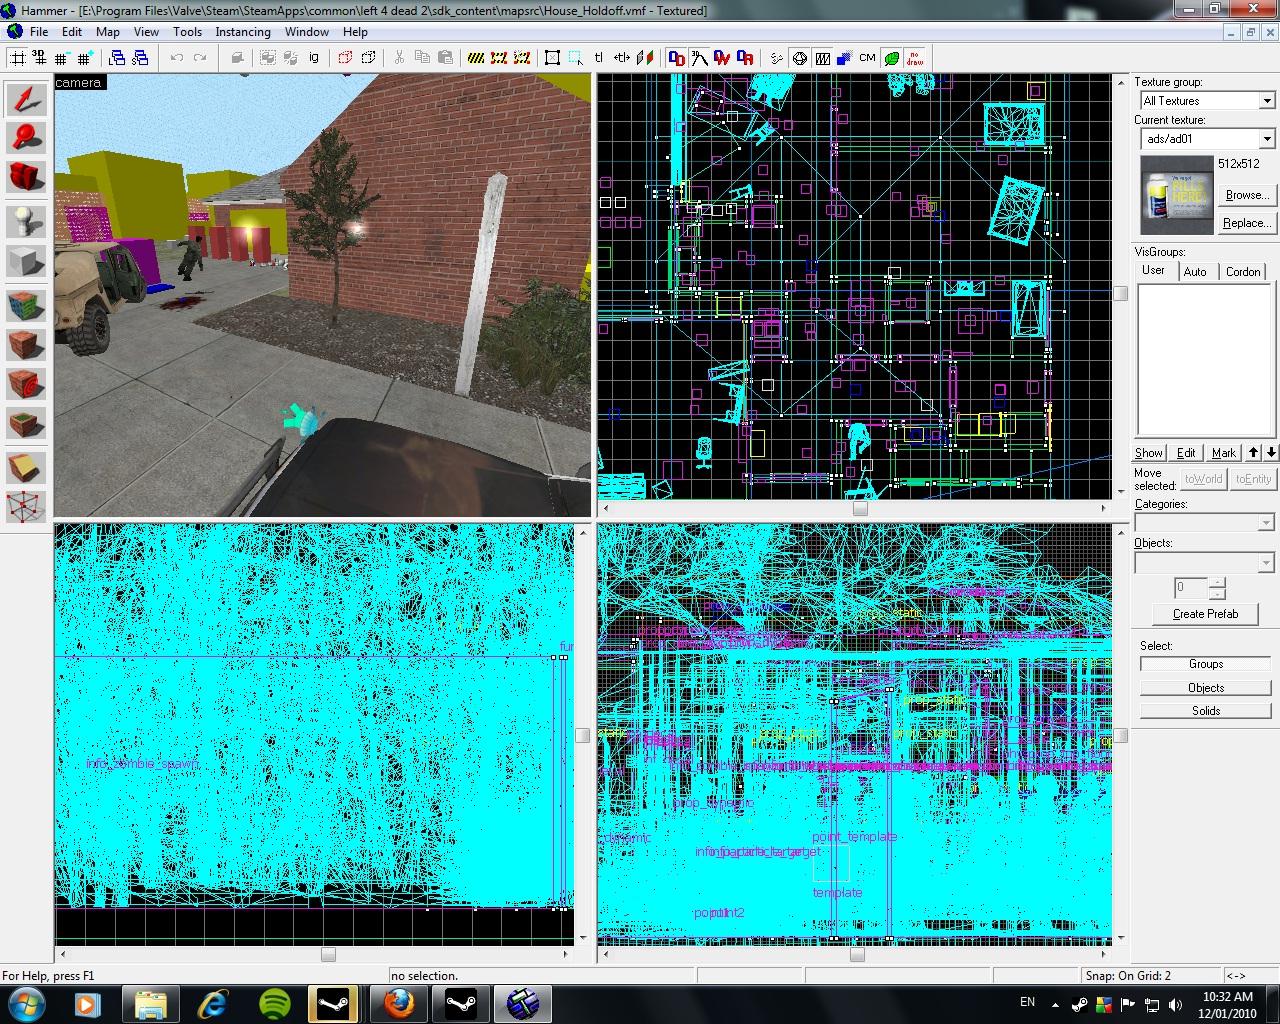 Left 4 Dead 2: House Holdoff Survival Map mod - Mod DB